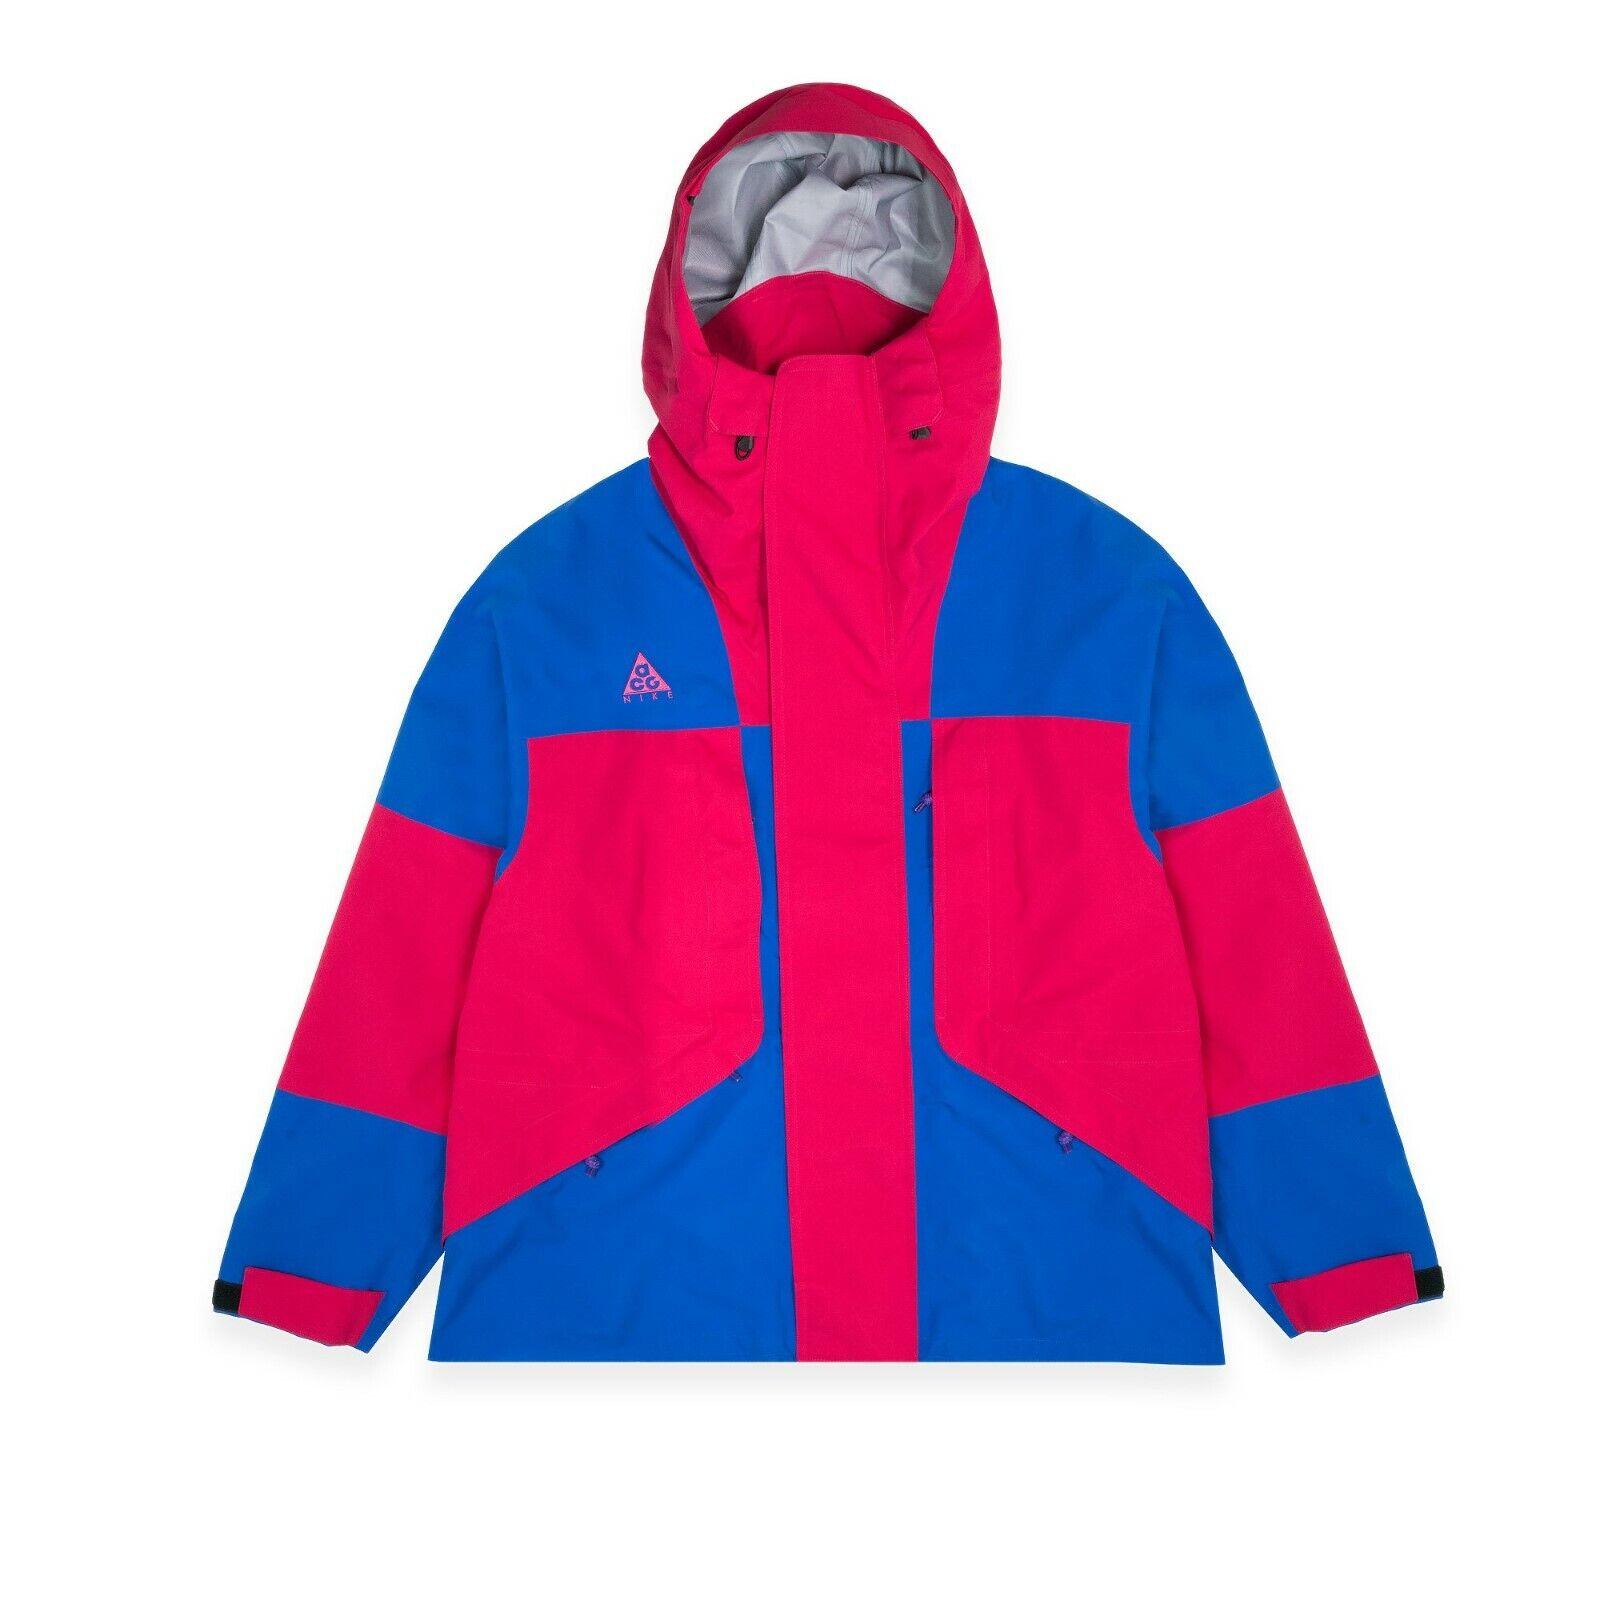 Nike ACG GORE-TEX Jacket Blue Rush Pink  Men's Size SMall